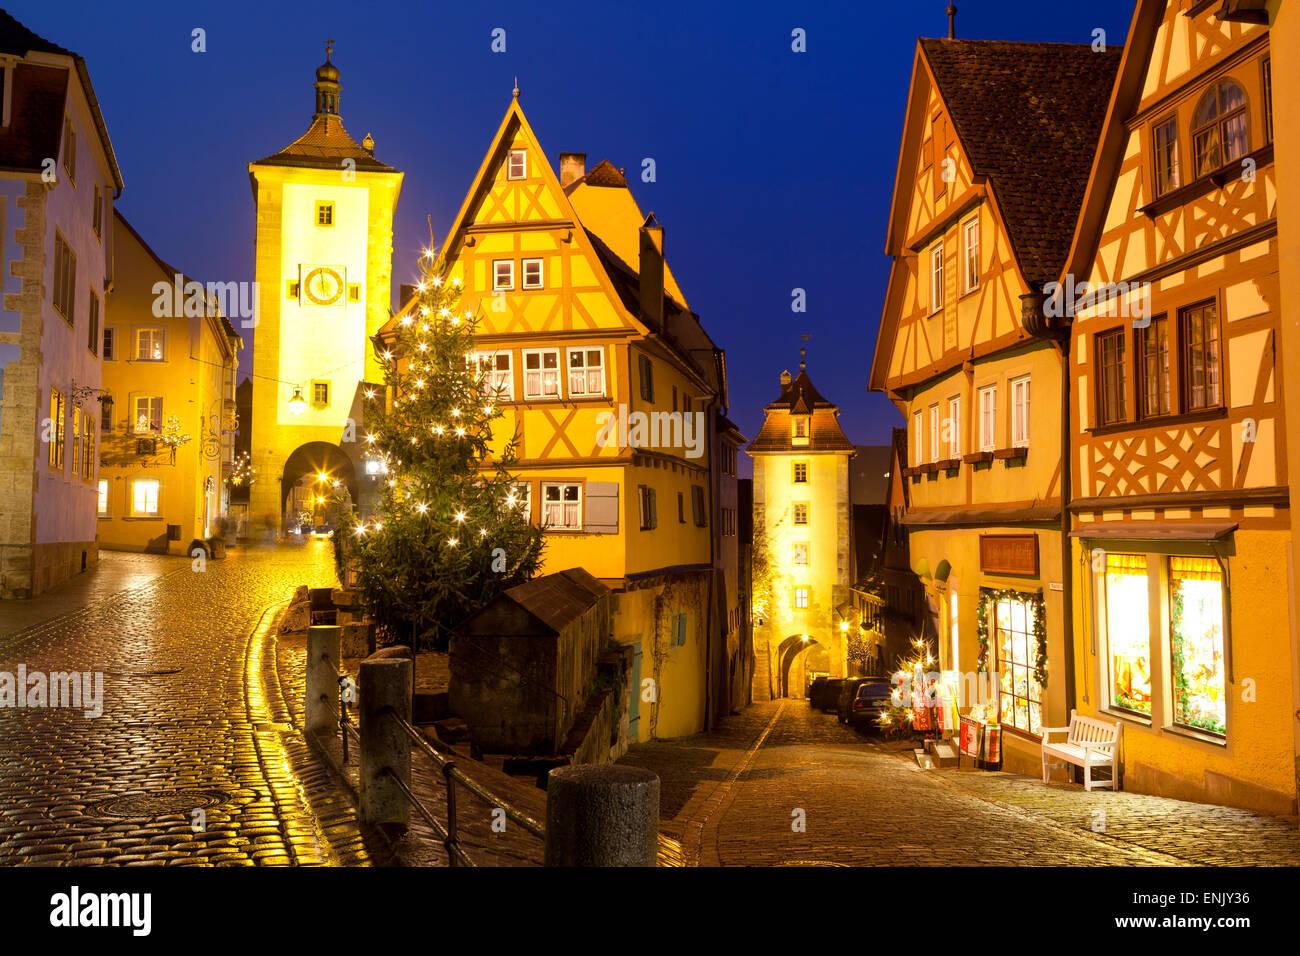 Christmas Tree at the Plonlein, Rothenburg ob der Tauber, Bavaria, Germany, Europe - Stock Image